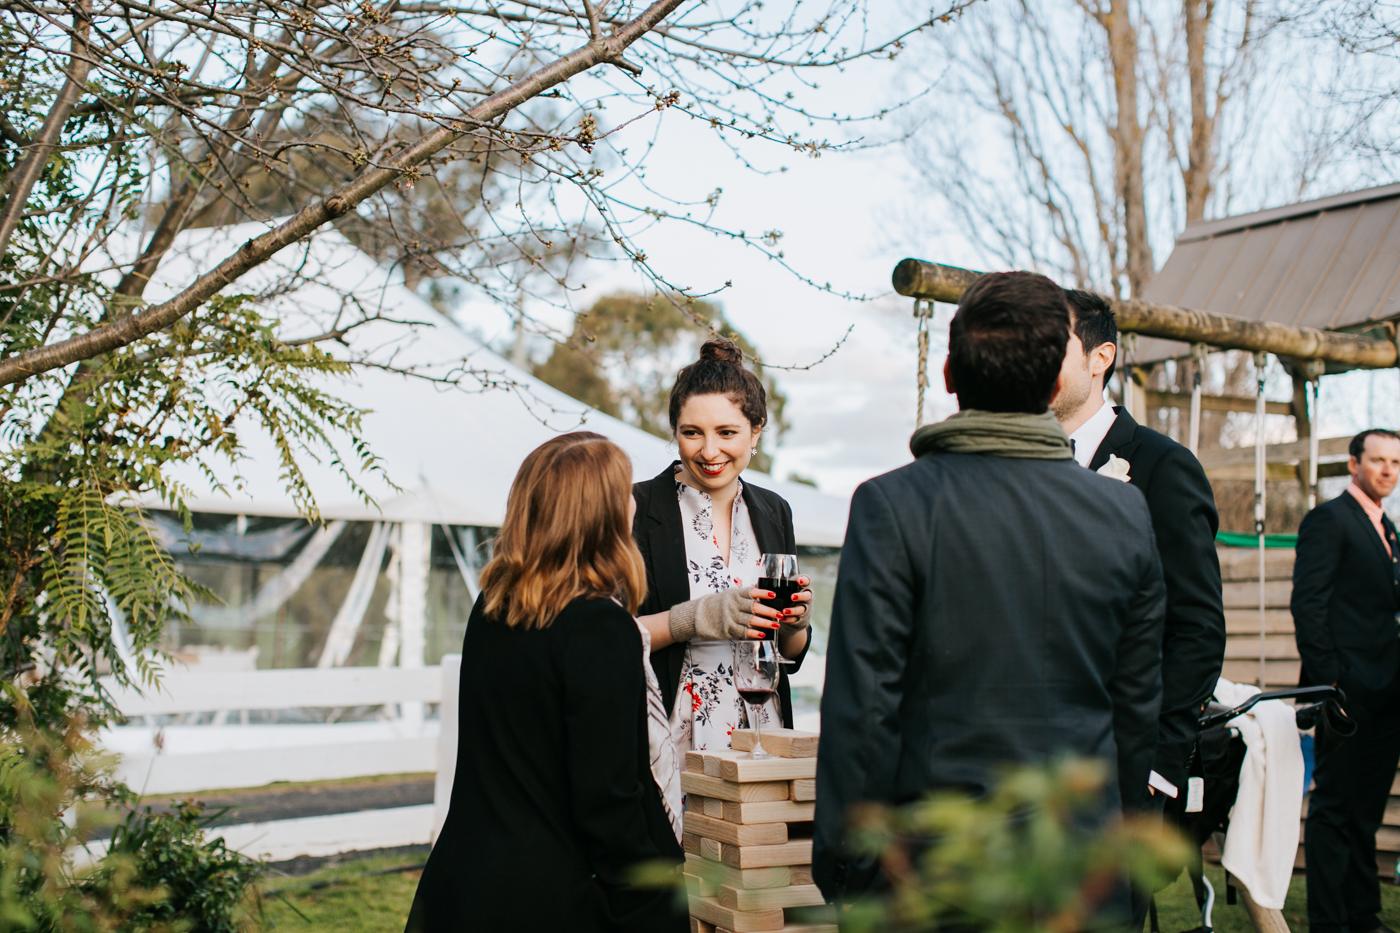 Bridget & James - Orange Country Wedding - Samantha Heather Photography-181.jpg